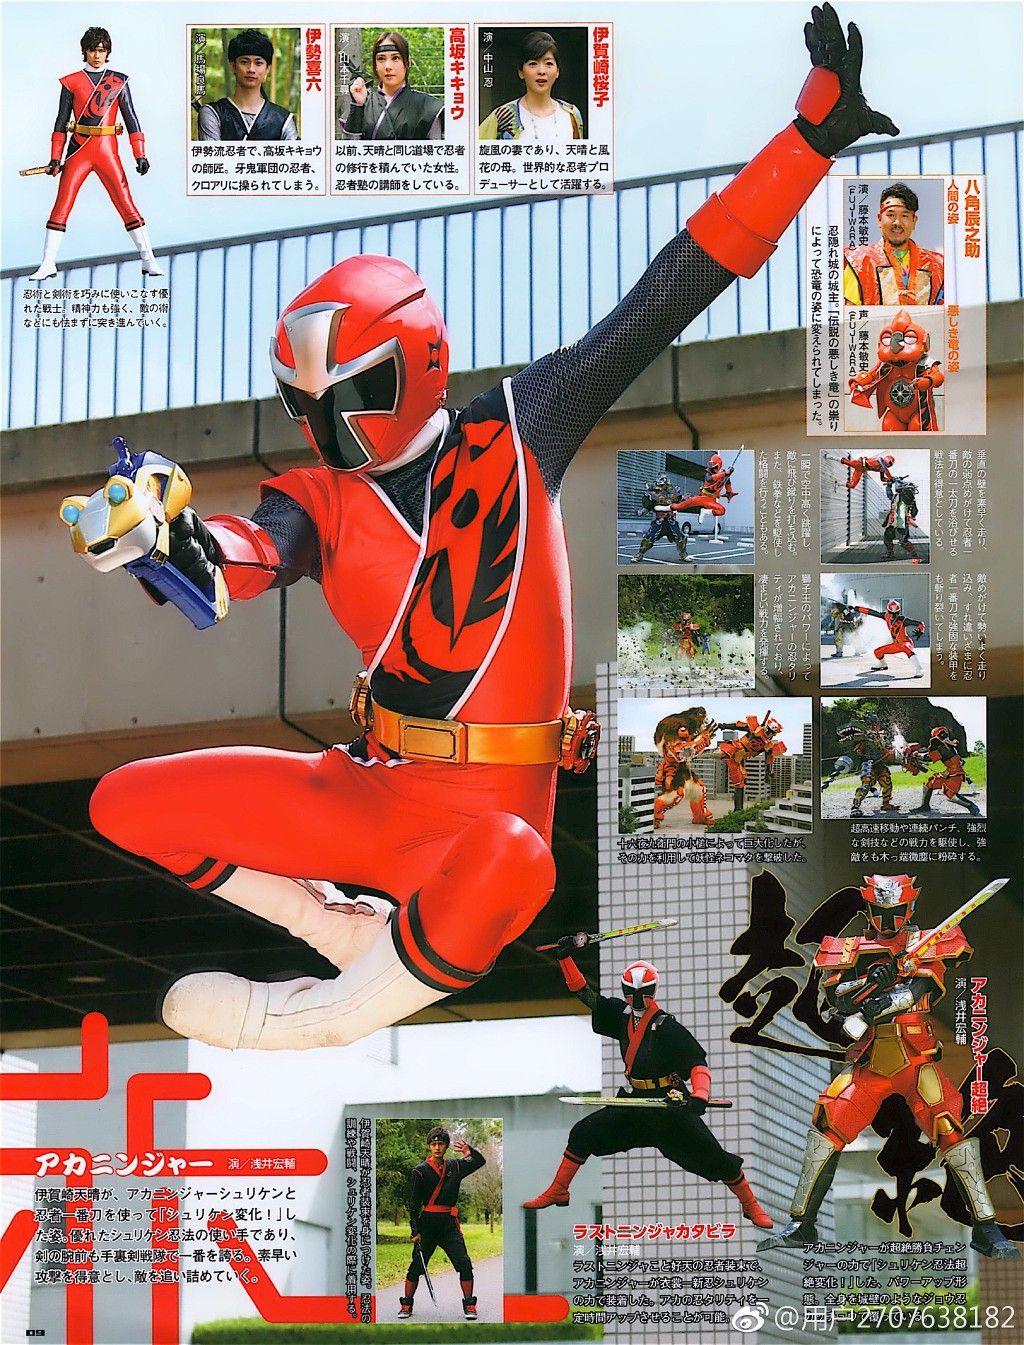 Shuriken Sentai Ninninger (With images) Anime lovers